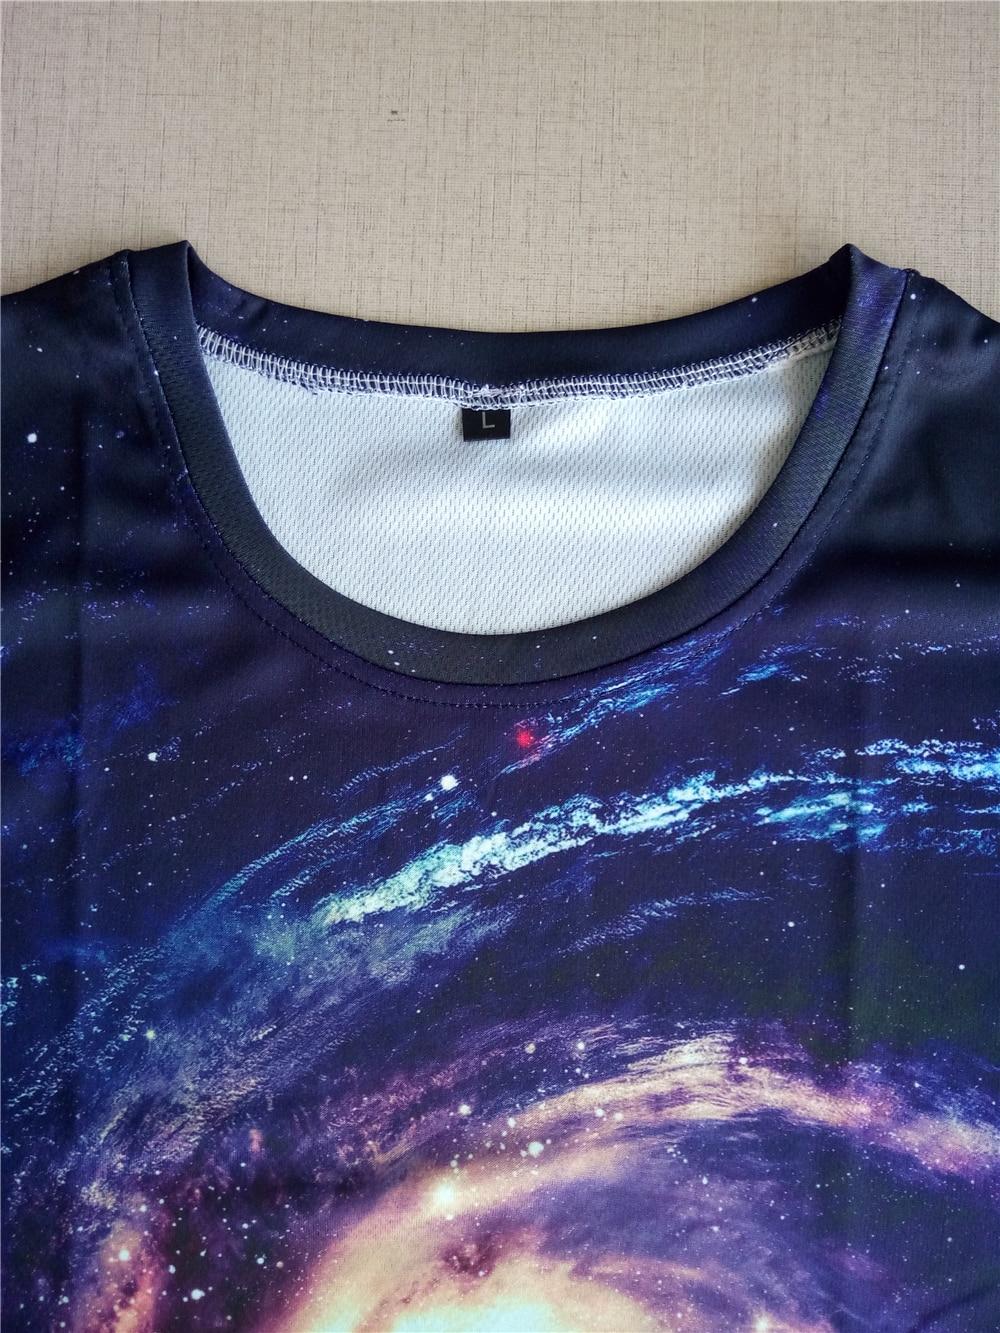 HTB1Ca GSpXXXXaOaXXXq6xXFXXXy - Galaxy Shirt Space T Shirt Men Short Sleeve 3d T-shirts Print Nebula T-shirt Fashion Brand Clothing Summer Tops Tees Cool Sim